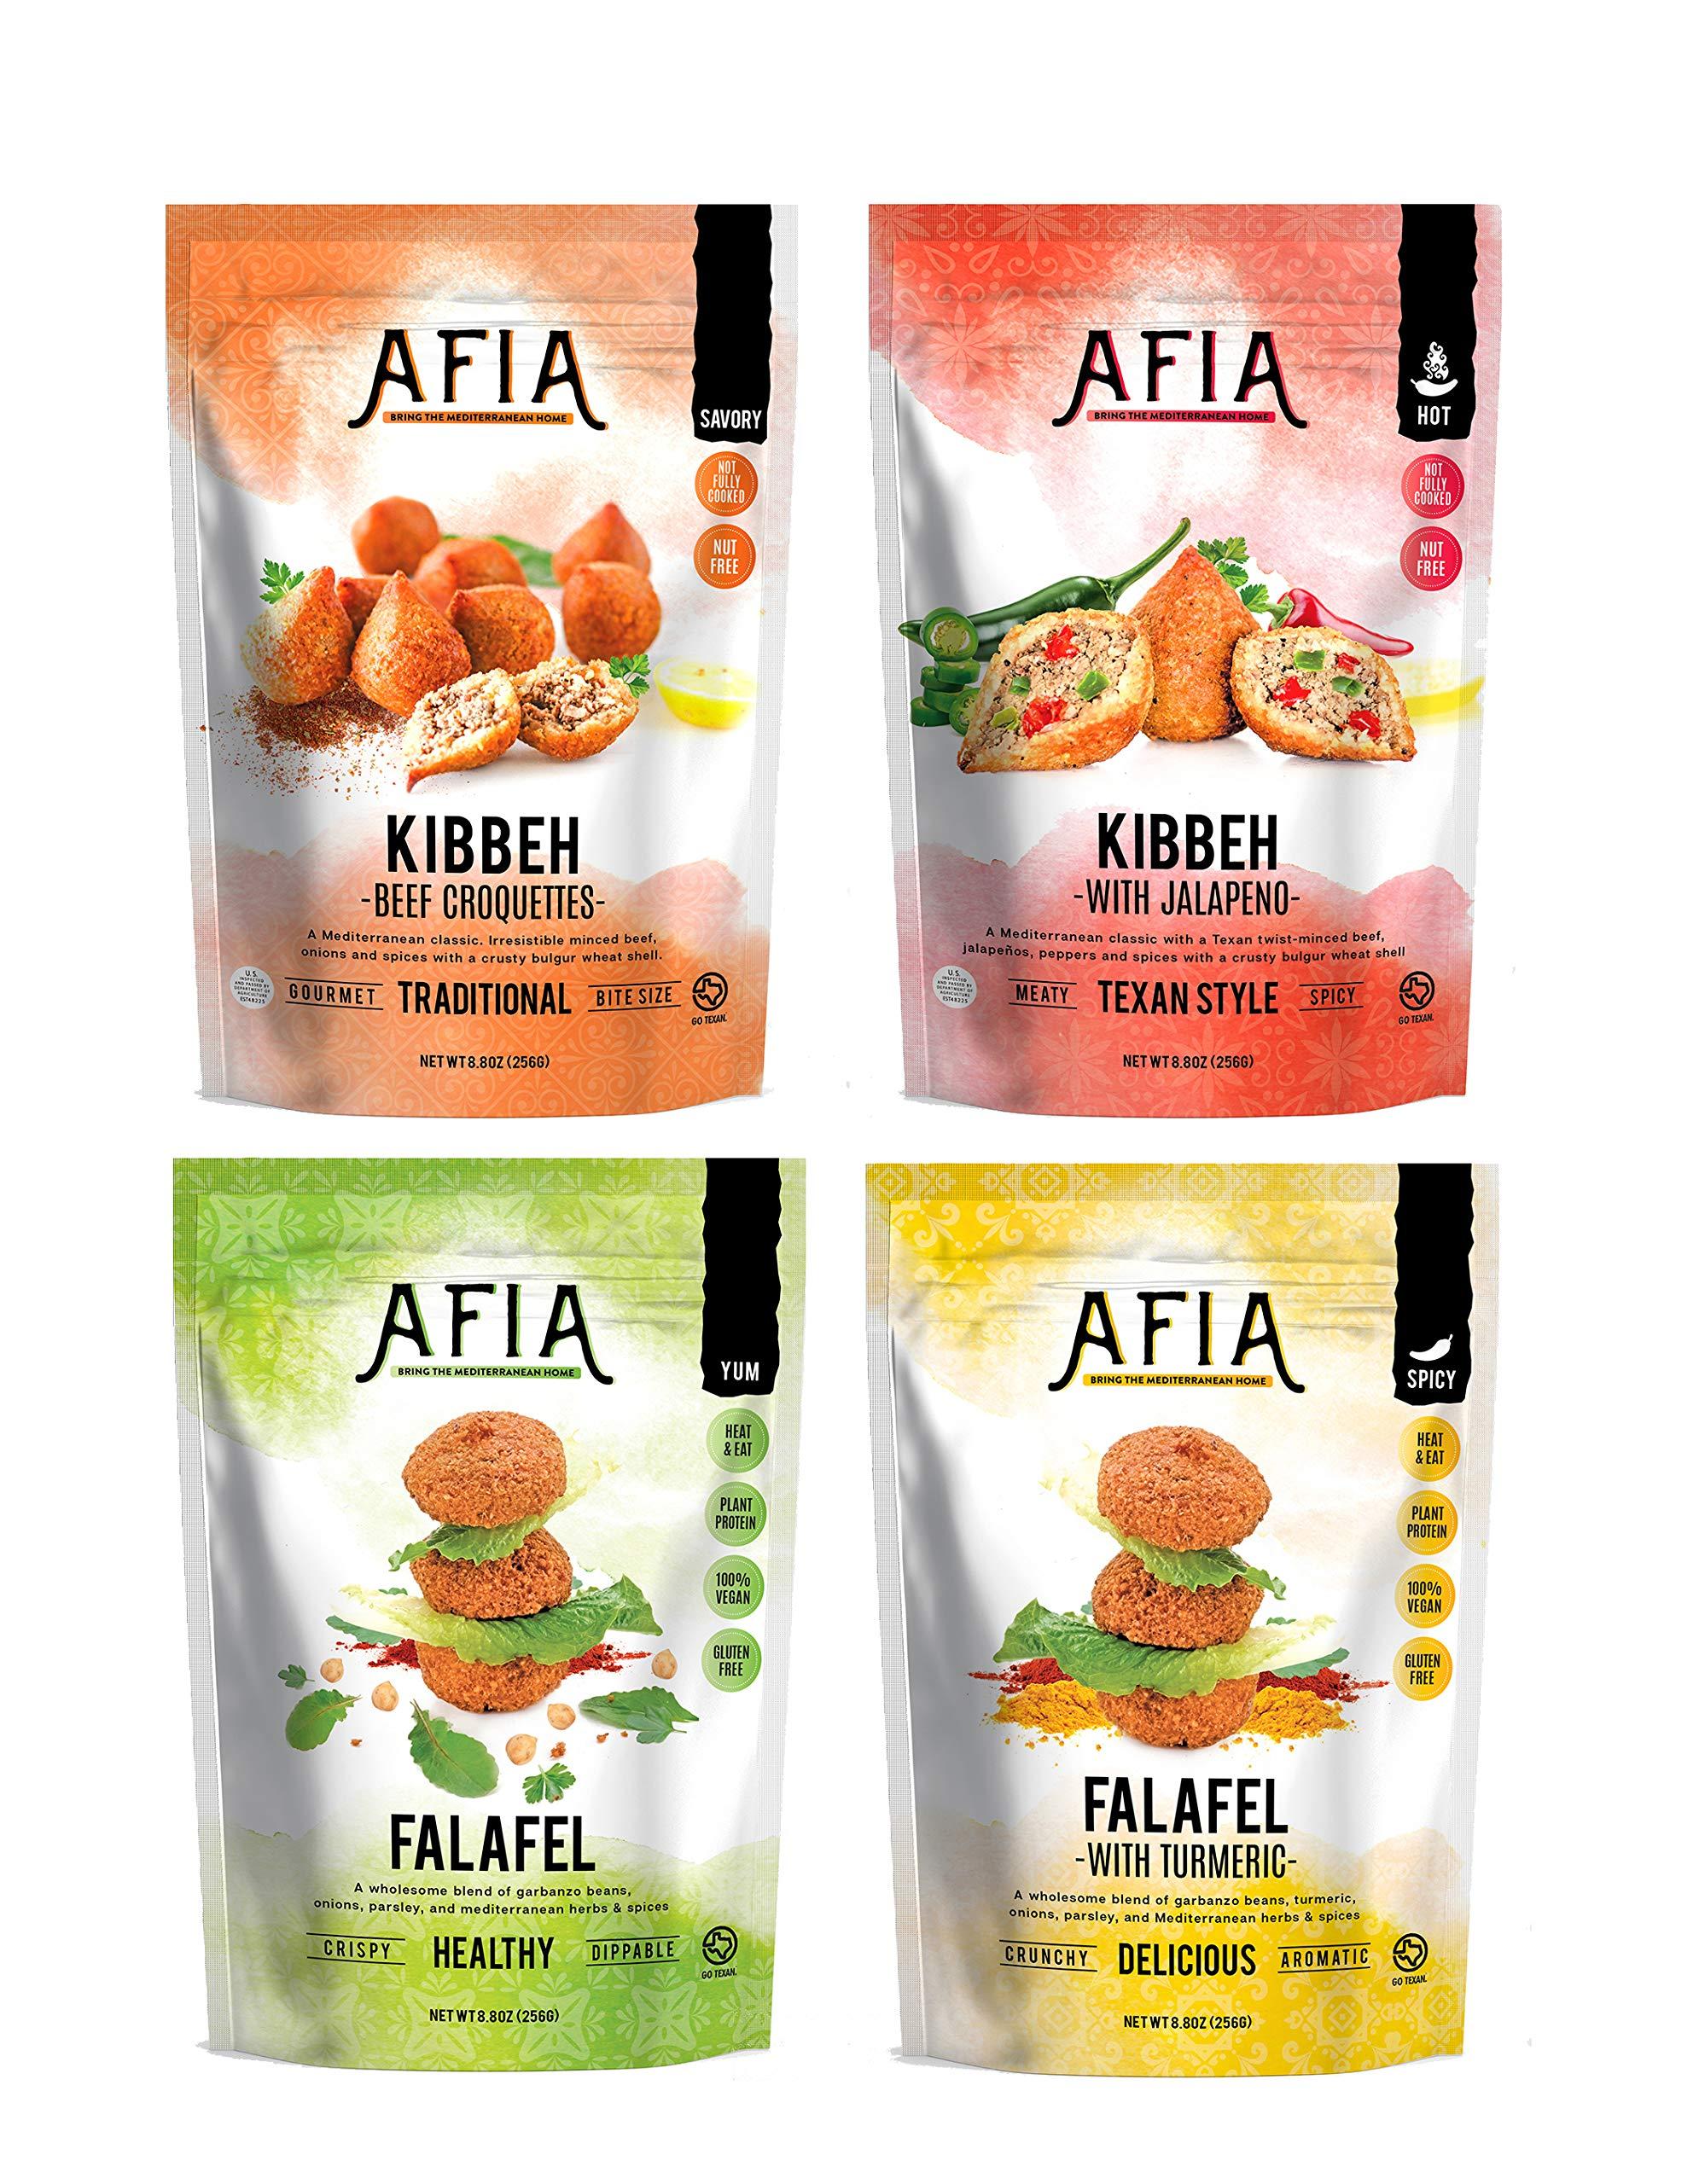 Frozen All Variety Kibbeh & Falafel Bundle - Pack of (10) bags - (approx 70 Falafel count + 40 Kibbeh count) - Just Heat & Eat!